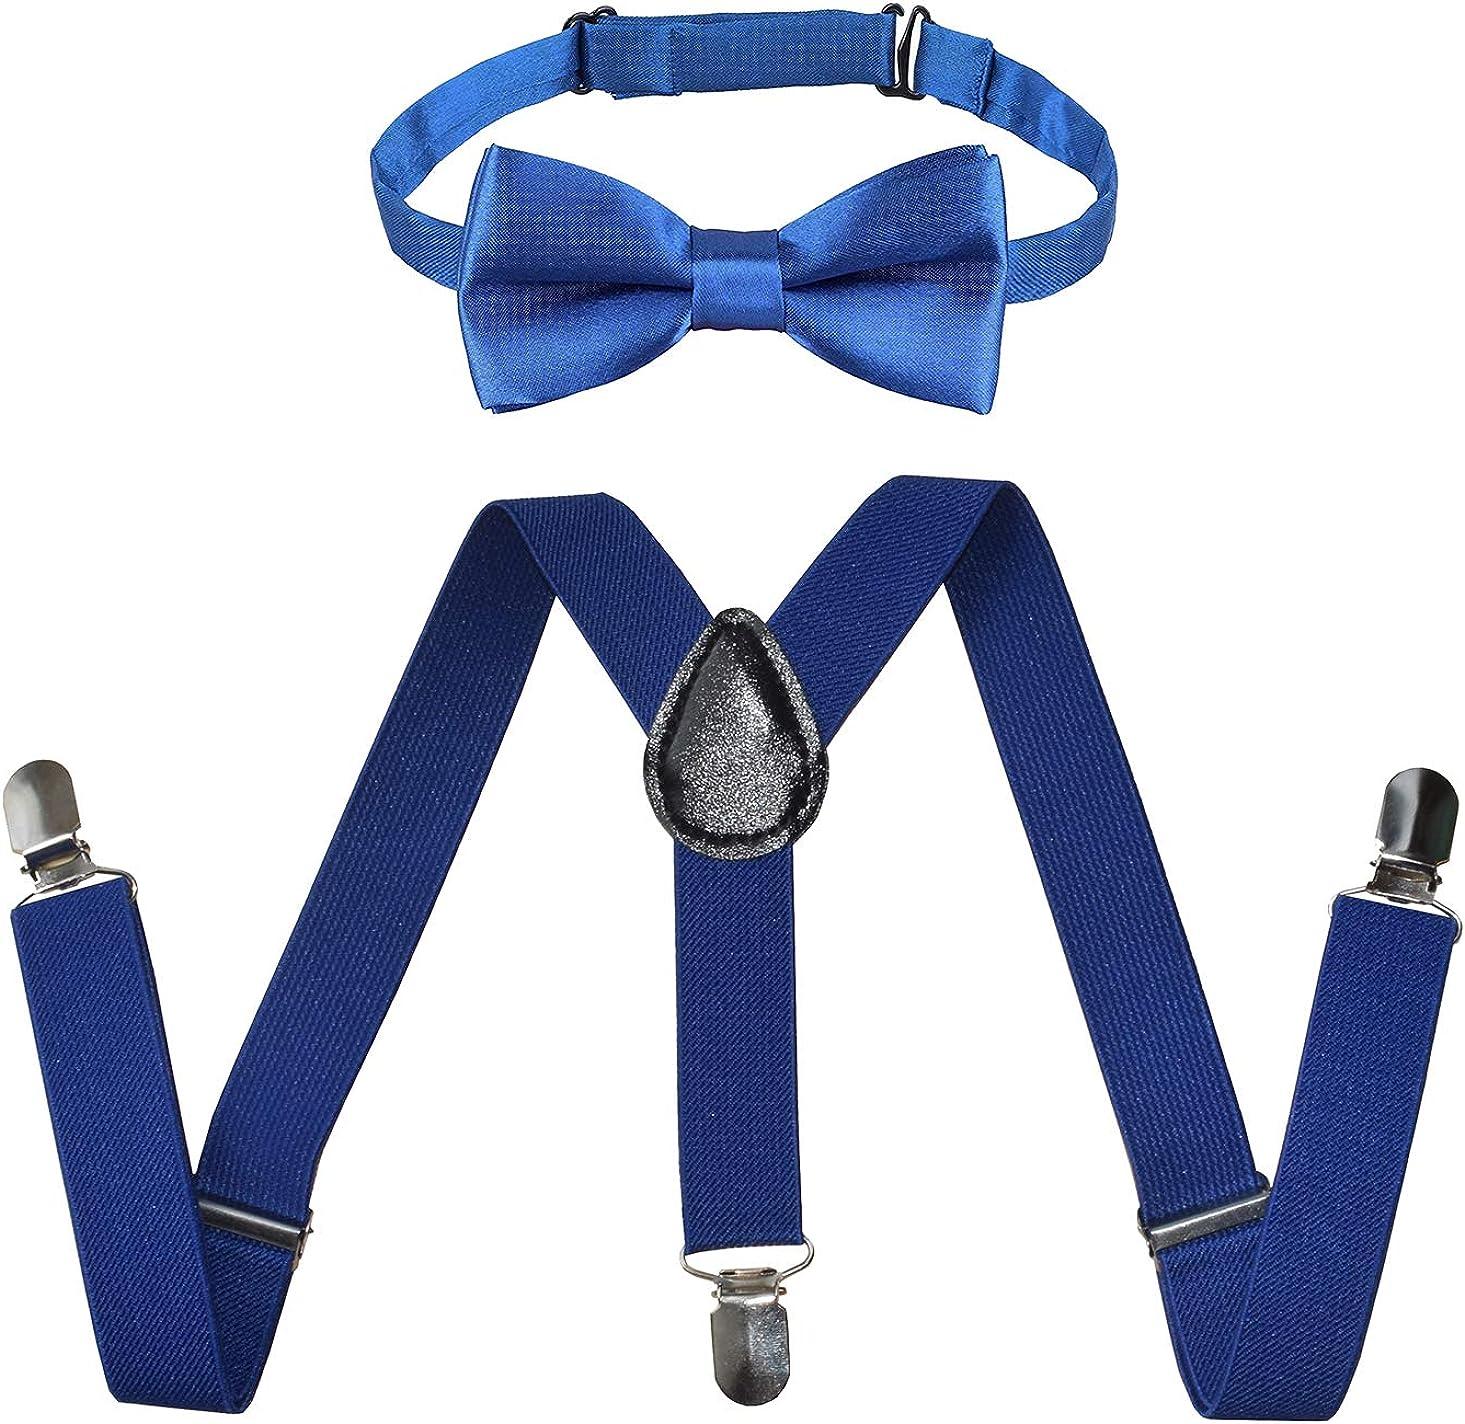 Kids Suspenders Bowtie Sales results No. 1 Set Adjustable Arlington Mall with Tie for Suspender Bow